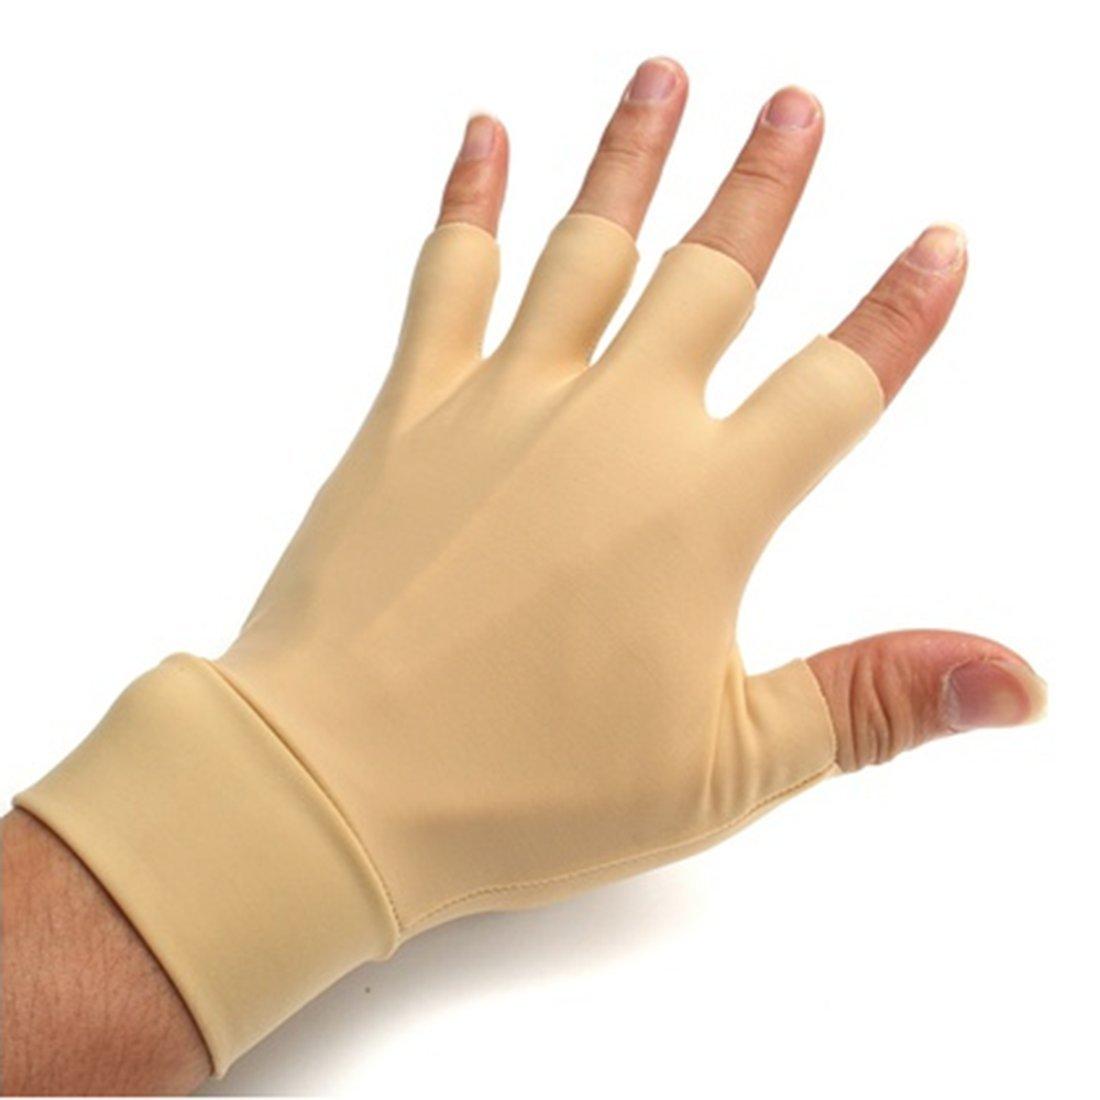 Arthritis Compression Gloves for Rheumatoid & Osteoarthritis - Sanbo Hand Gloves Provide Arthritic Joint Pain Symptom Relief - Men & Women - Fingerless